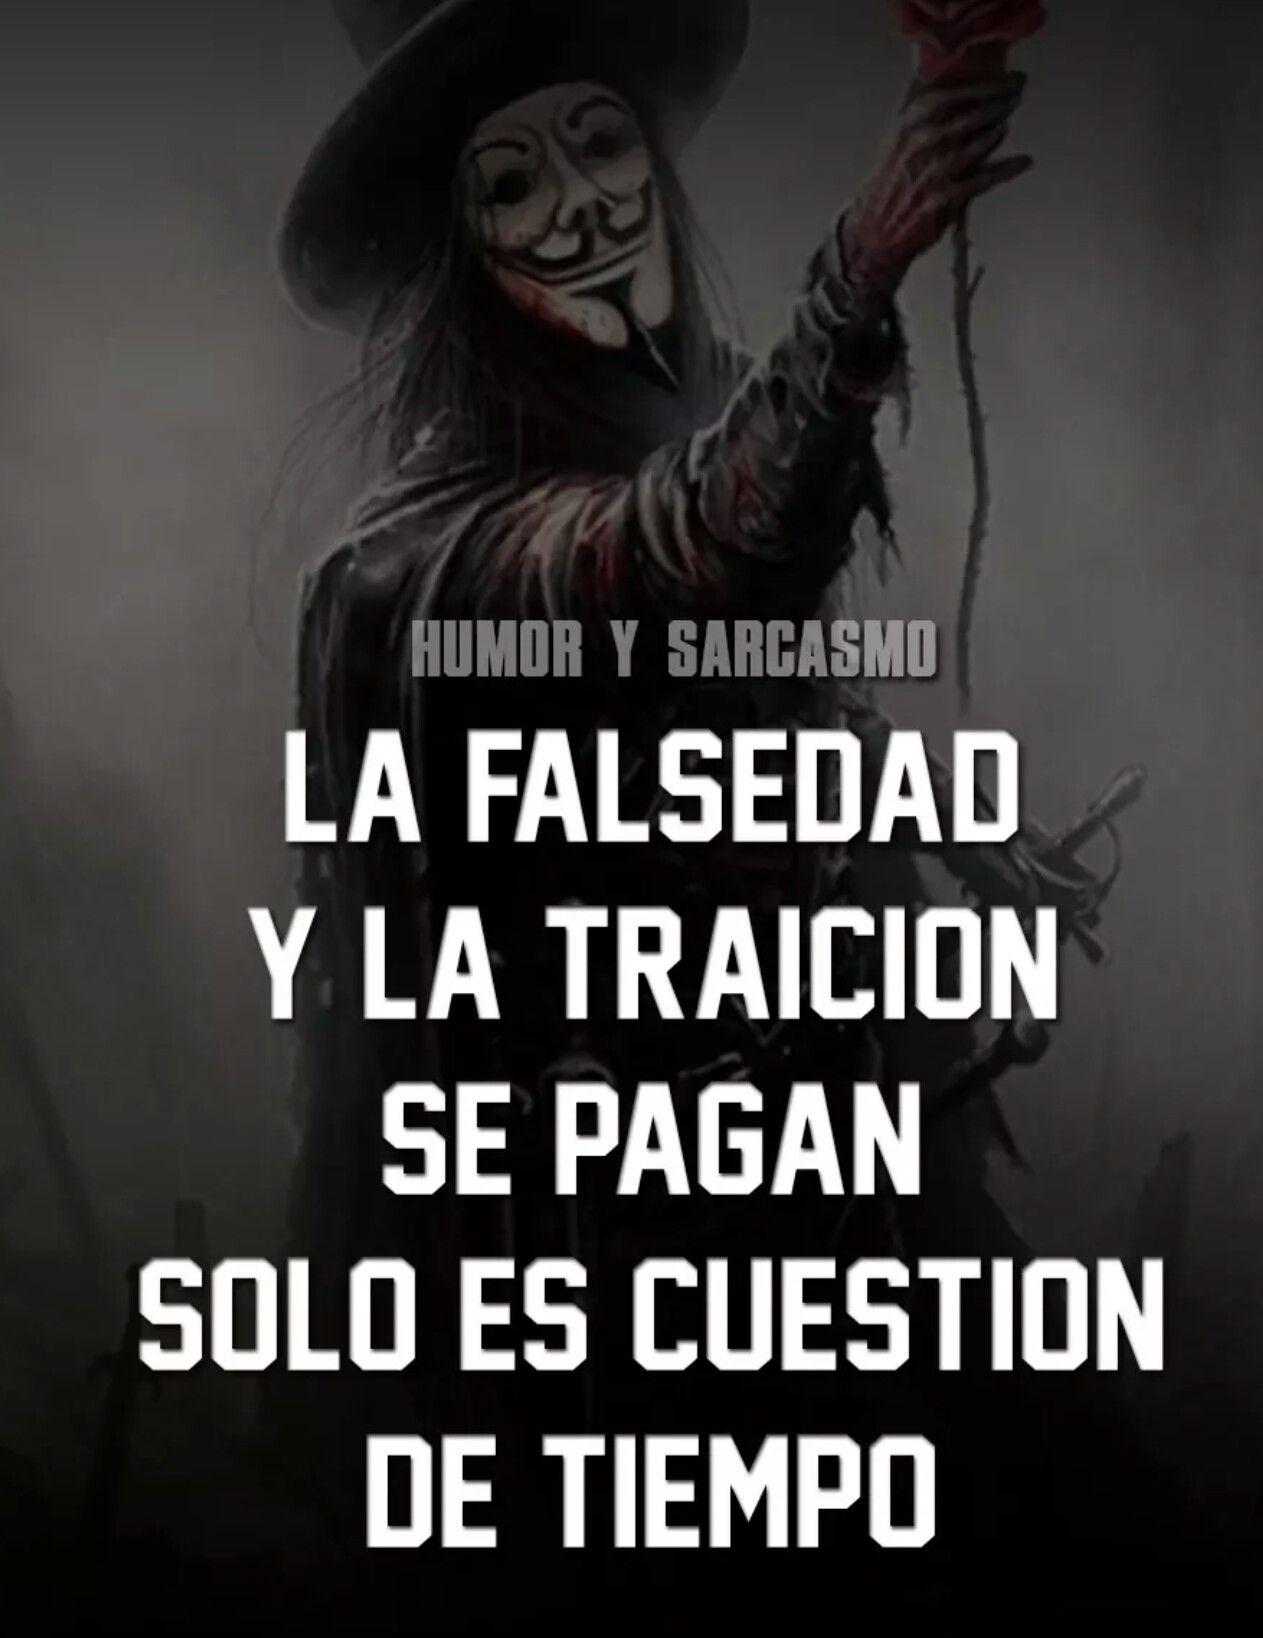 Pensamientos Falsedad Frases De Traicion Wwwmiifotoscom